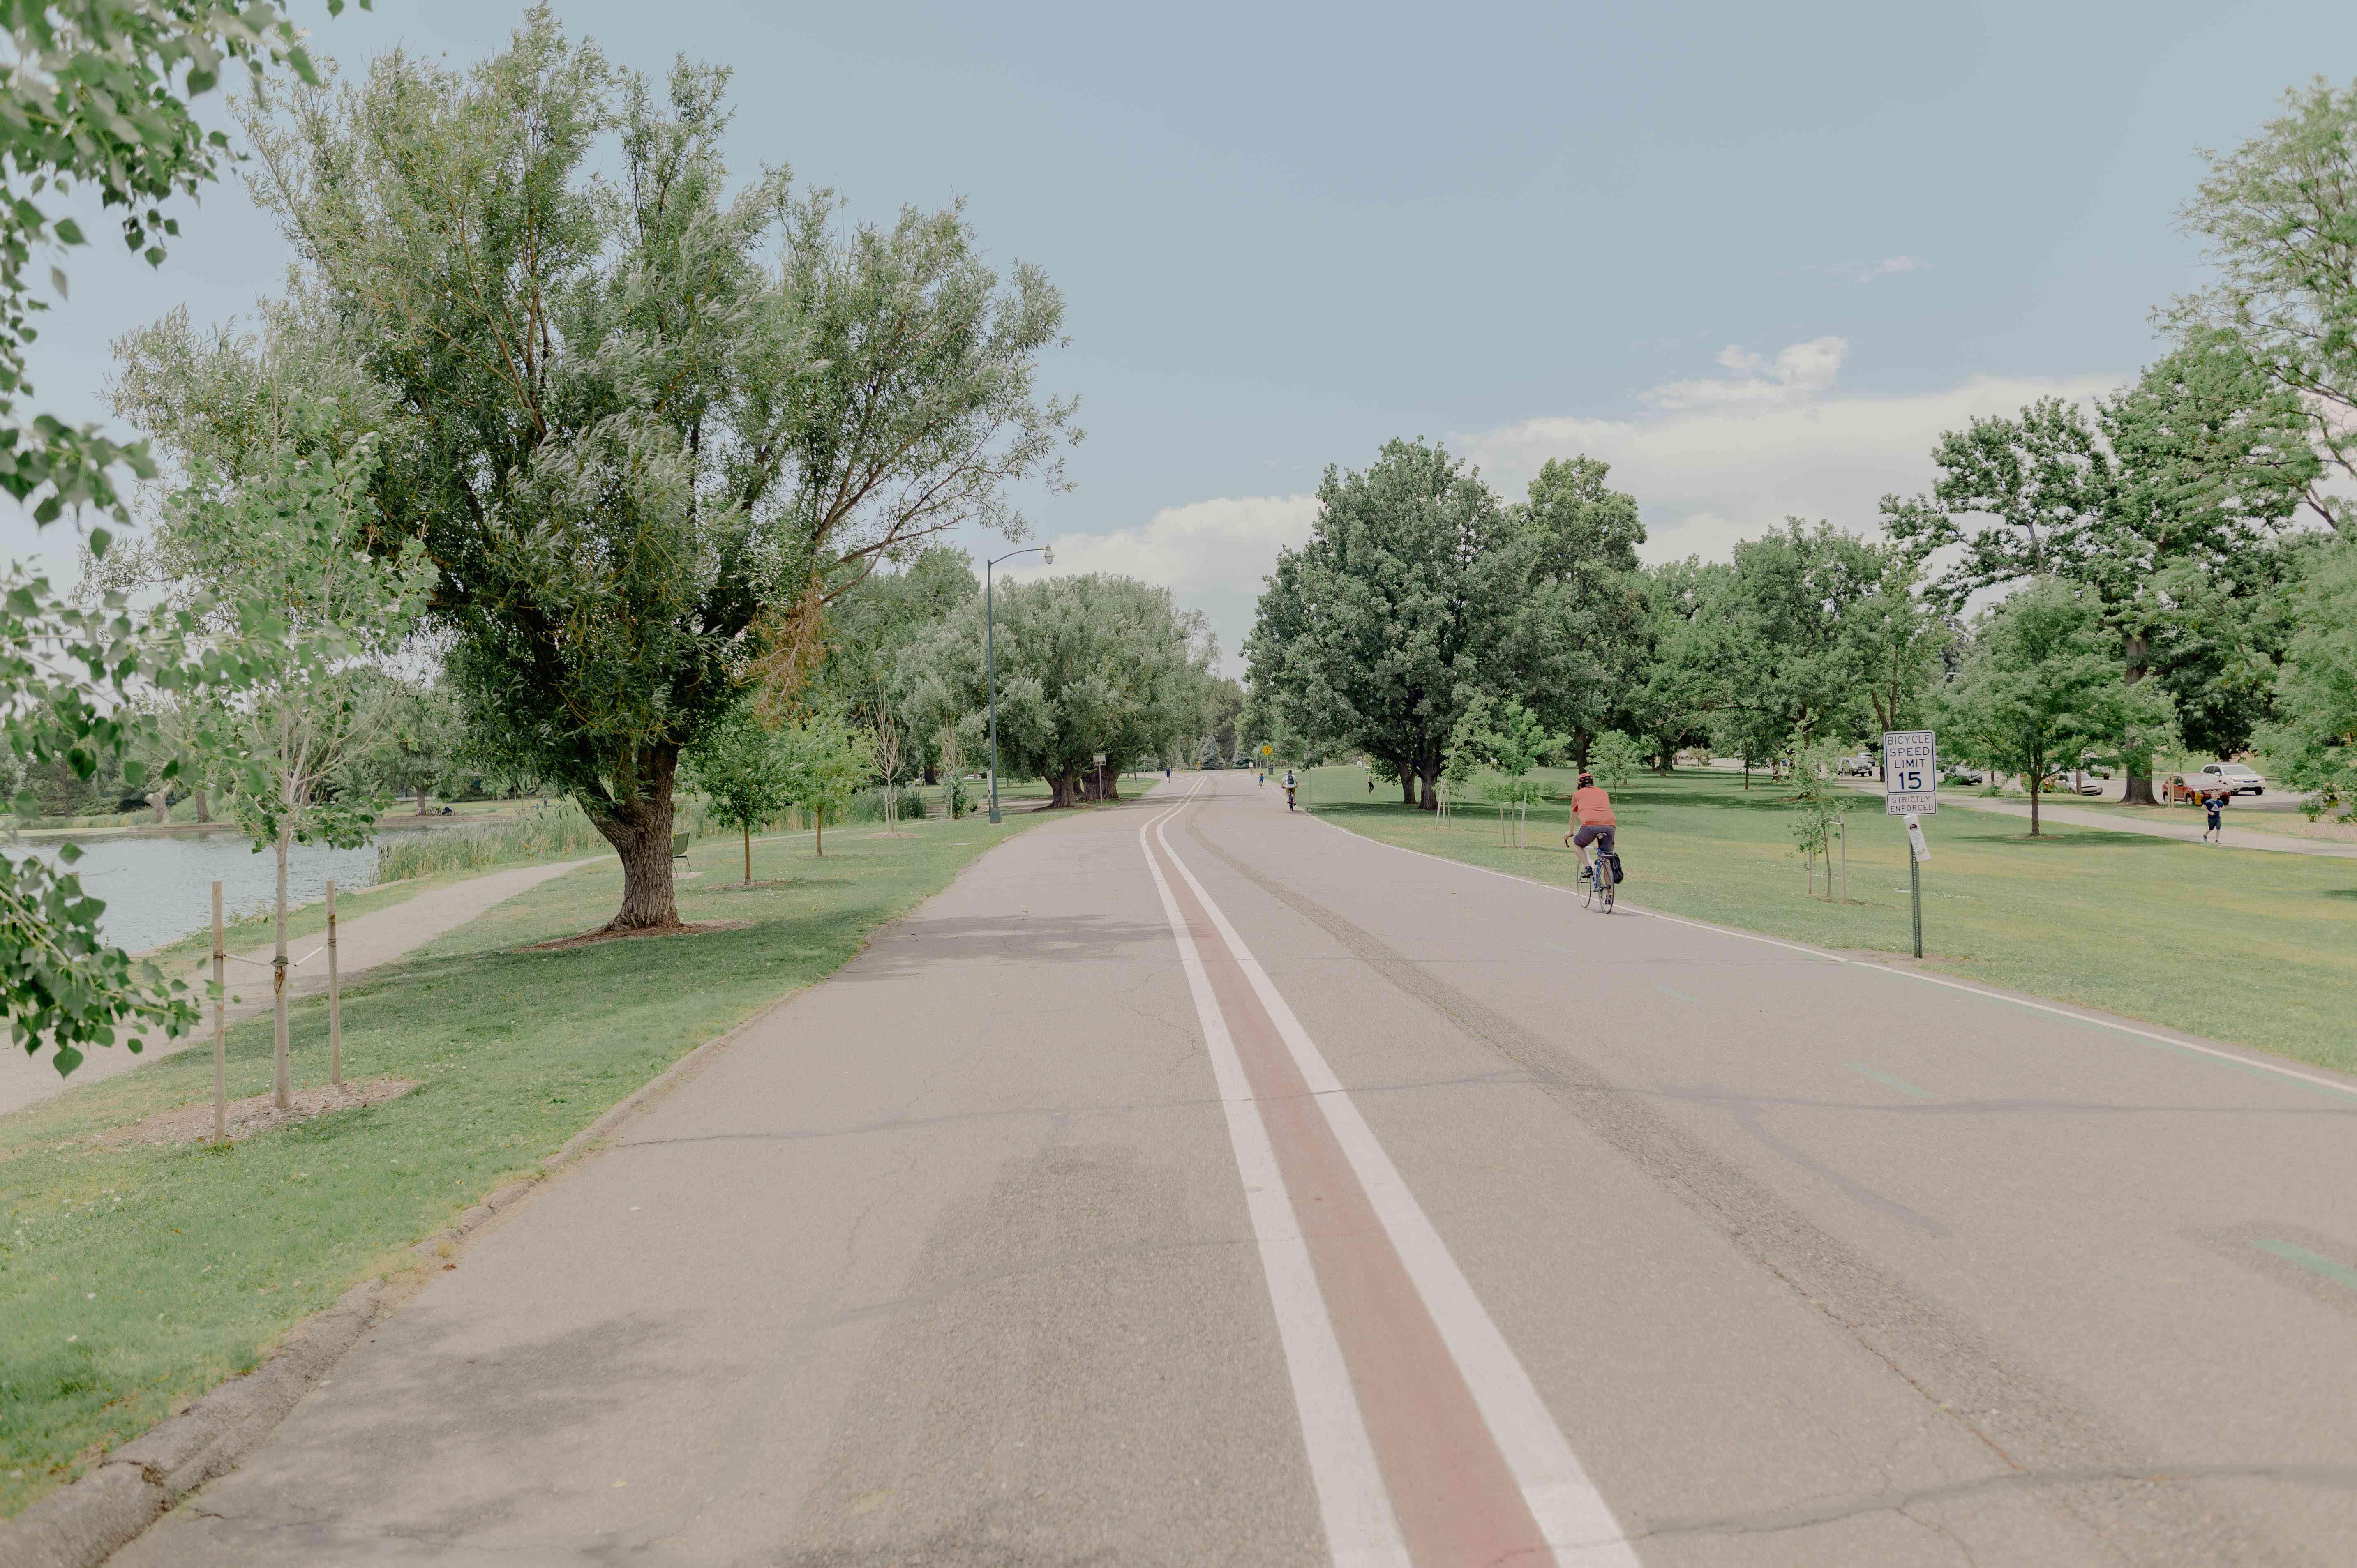 People biking in Washington Park in Denver